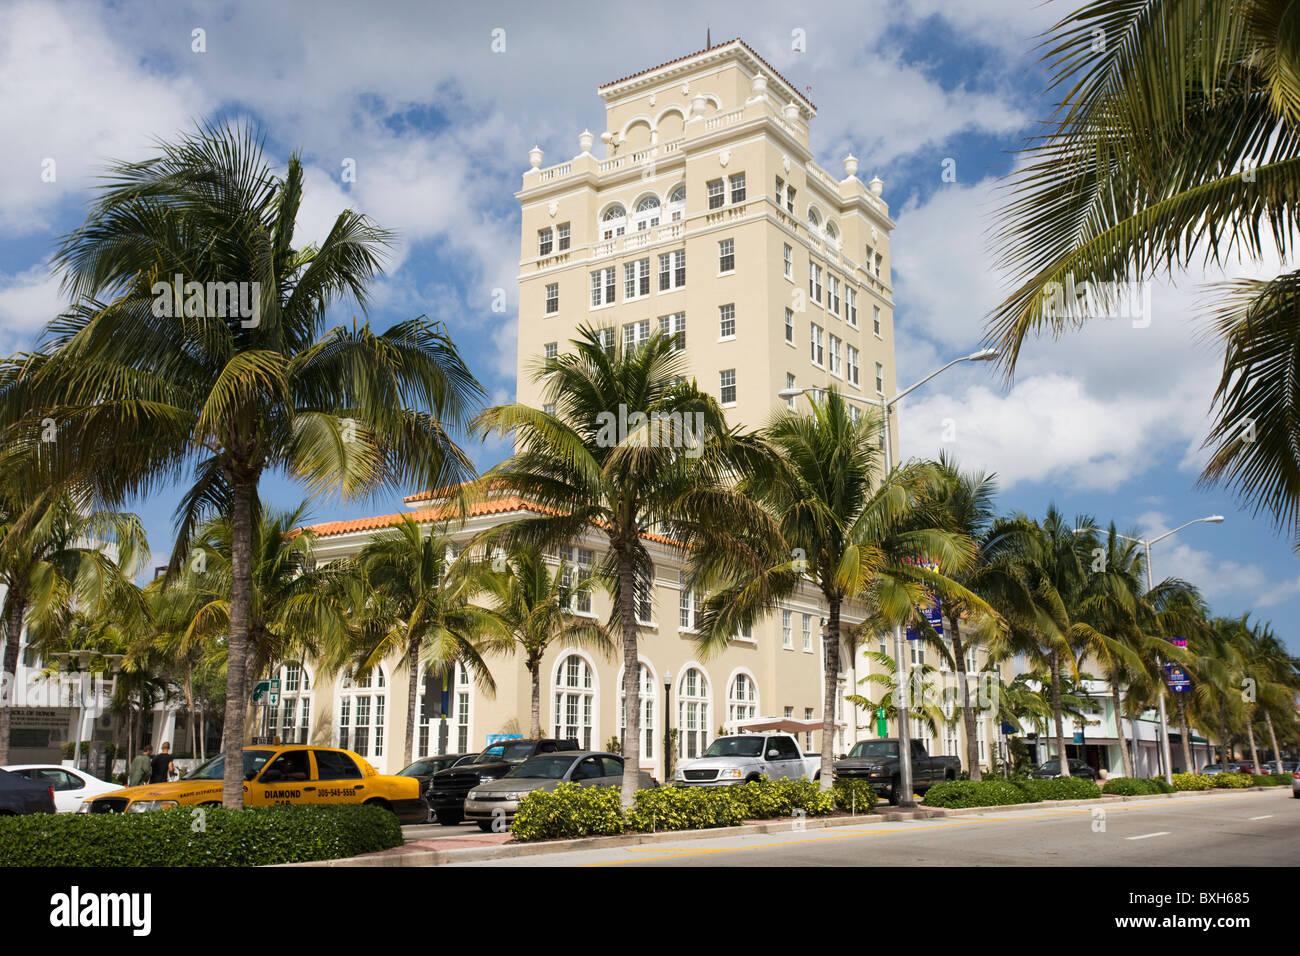 Old City Hall, Washington Street, in Miami's famous Art Deco district at South Beach, Miami, Florida, USA - Stock Image